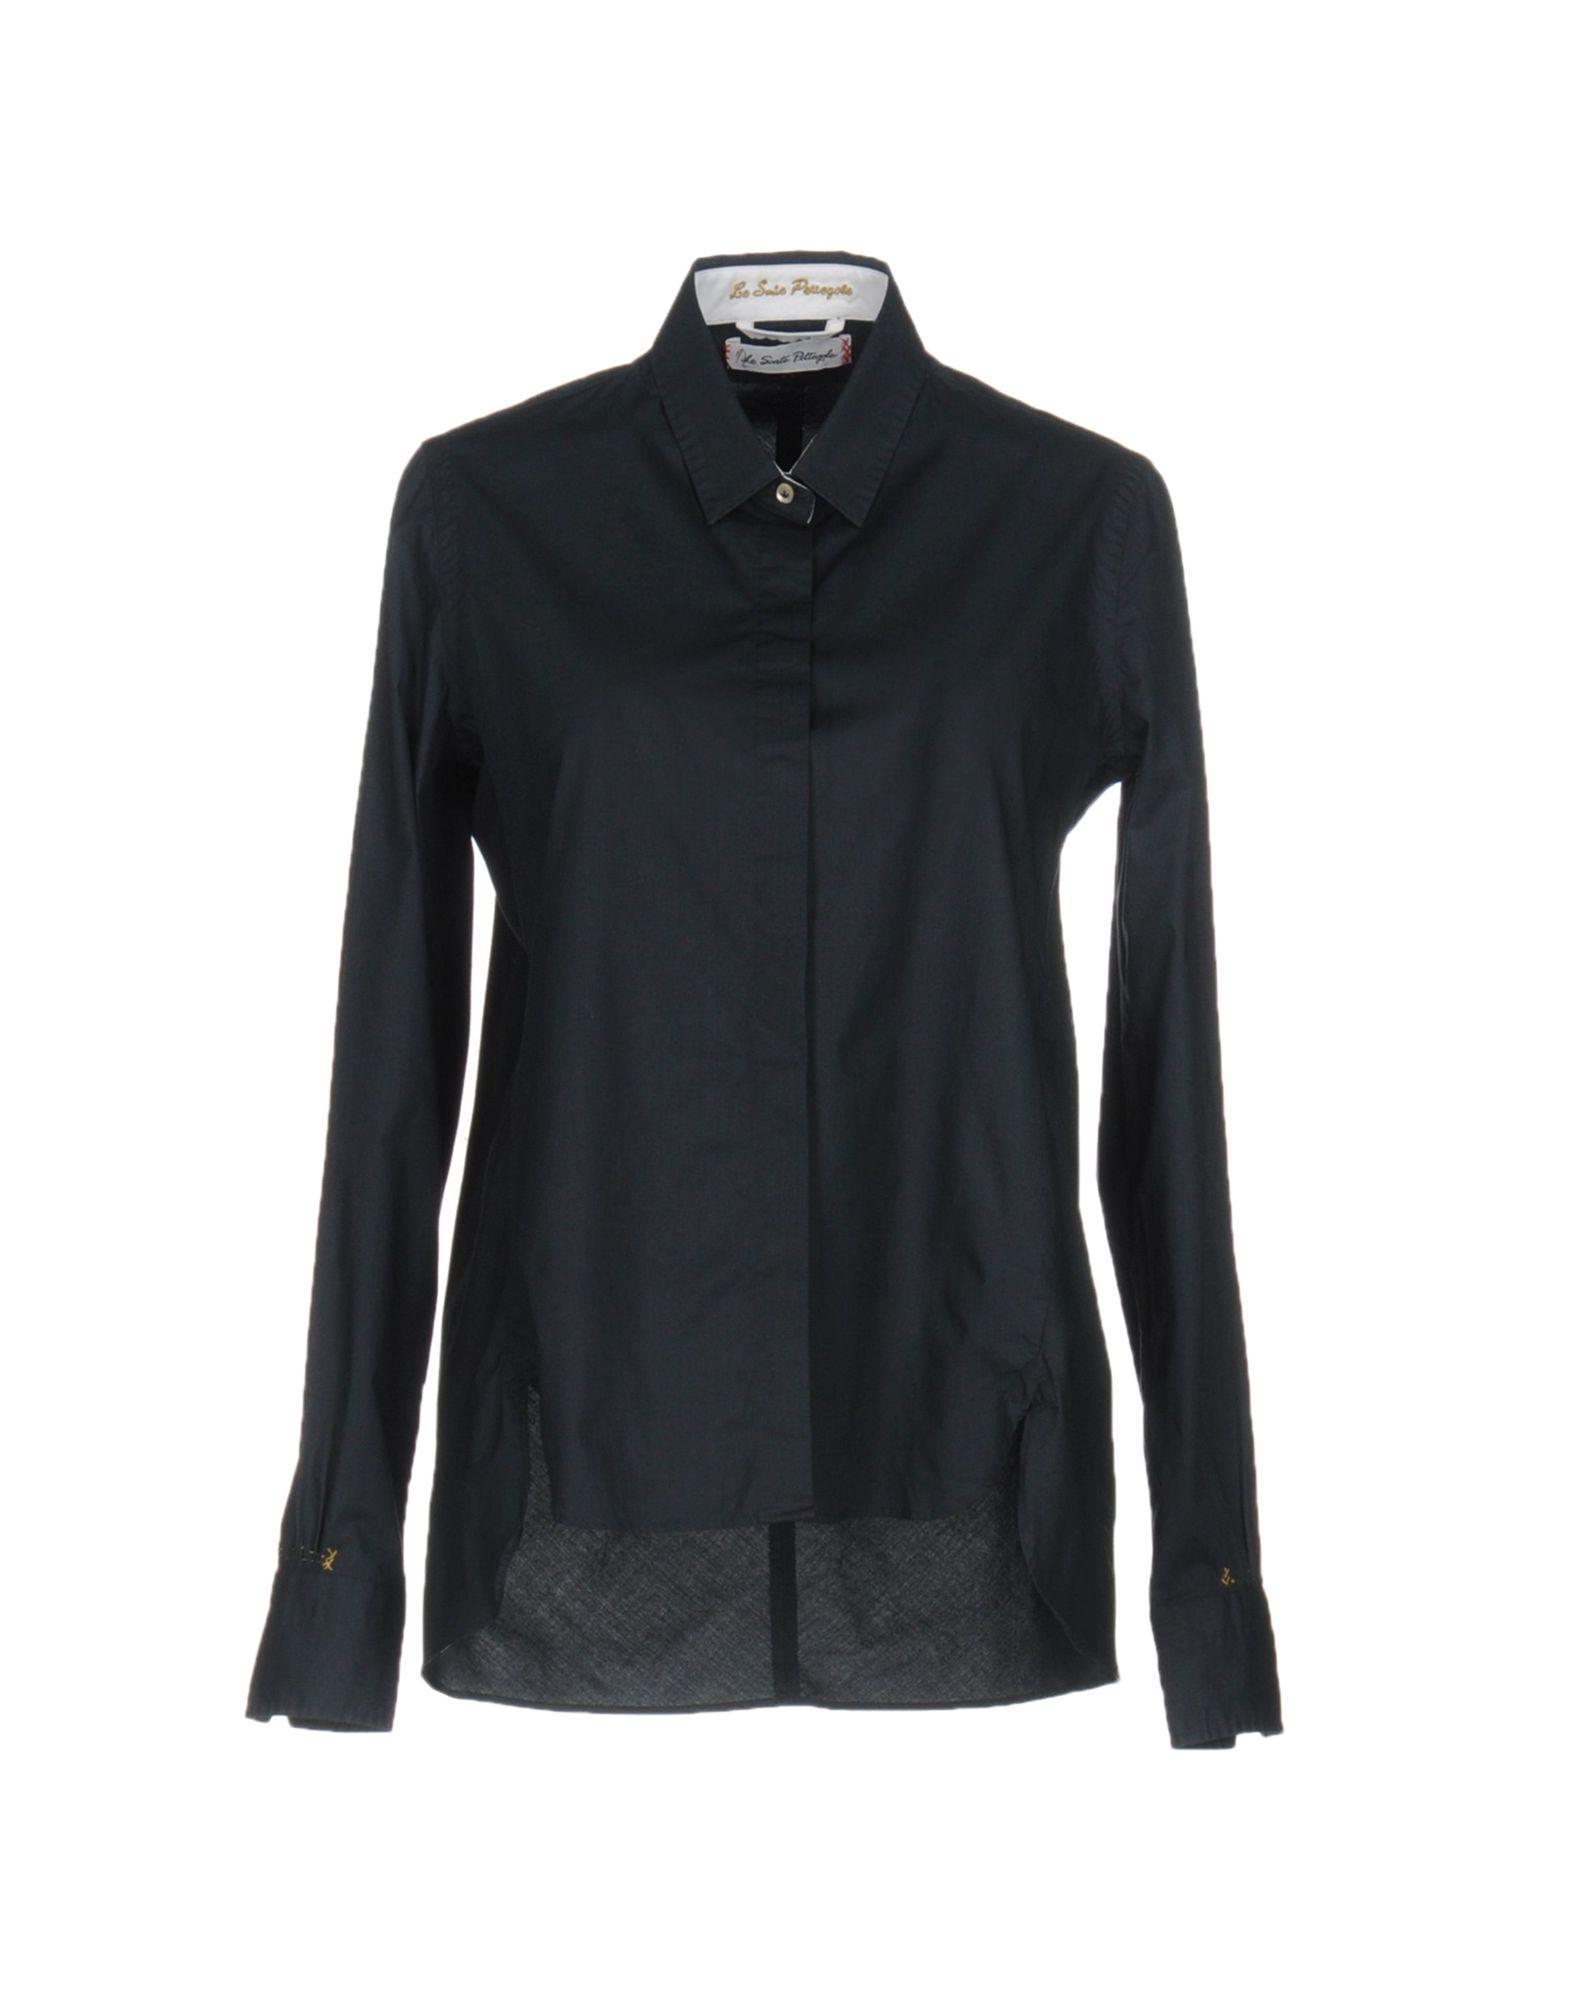 LE SARTE PETTEGOLE Damen Hemd Farbe Dunkelblau Größe 7